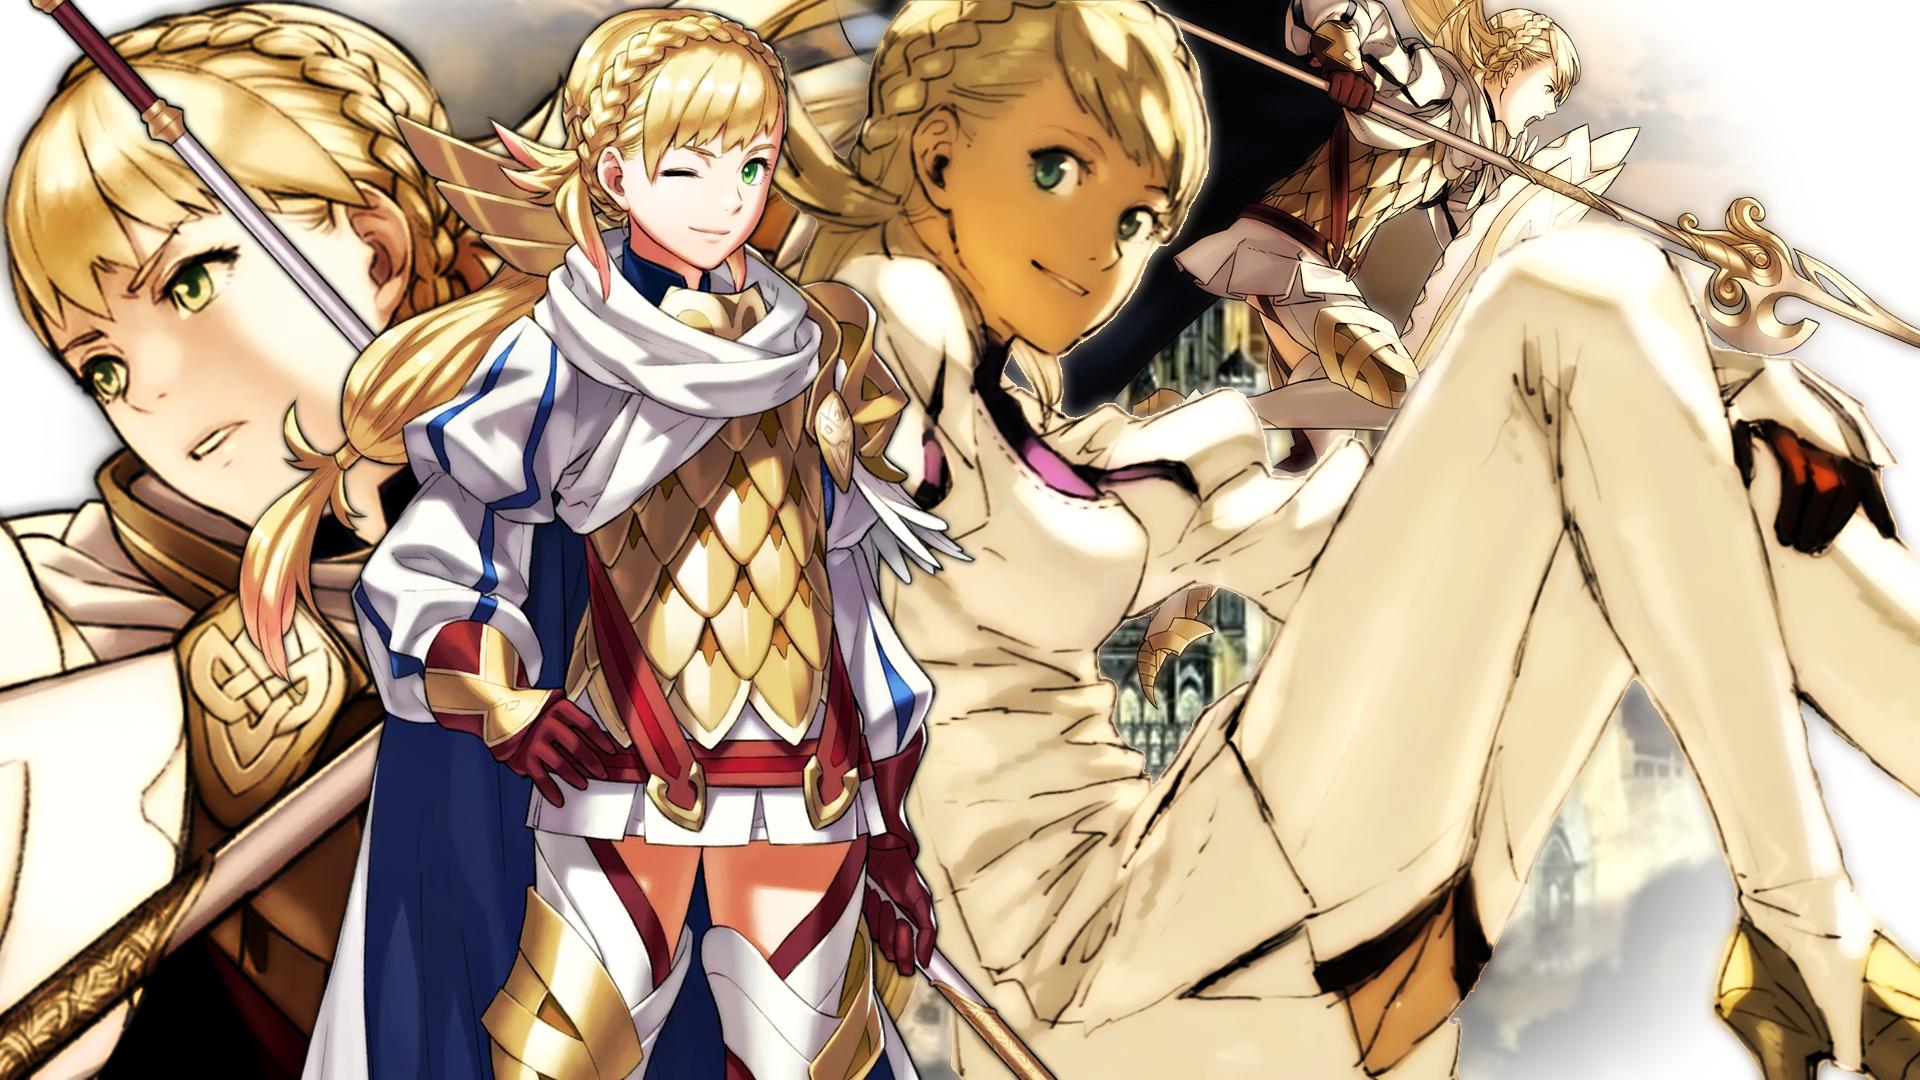 Fire Emblem Heroes - Sharena Wallpaper